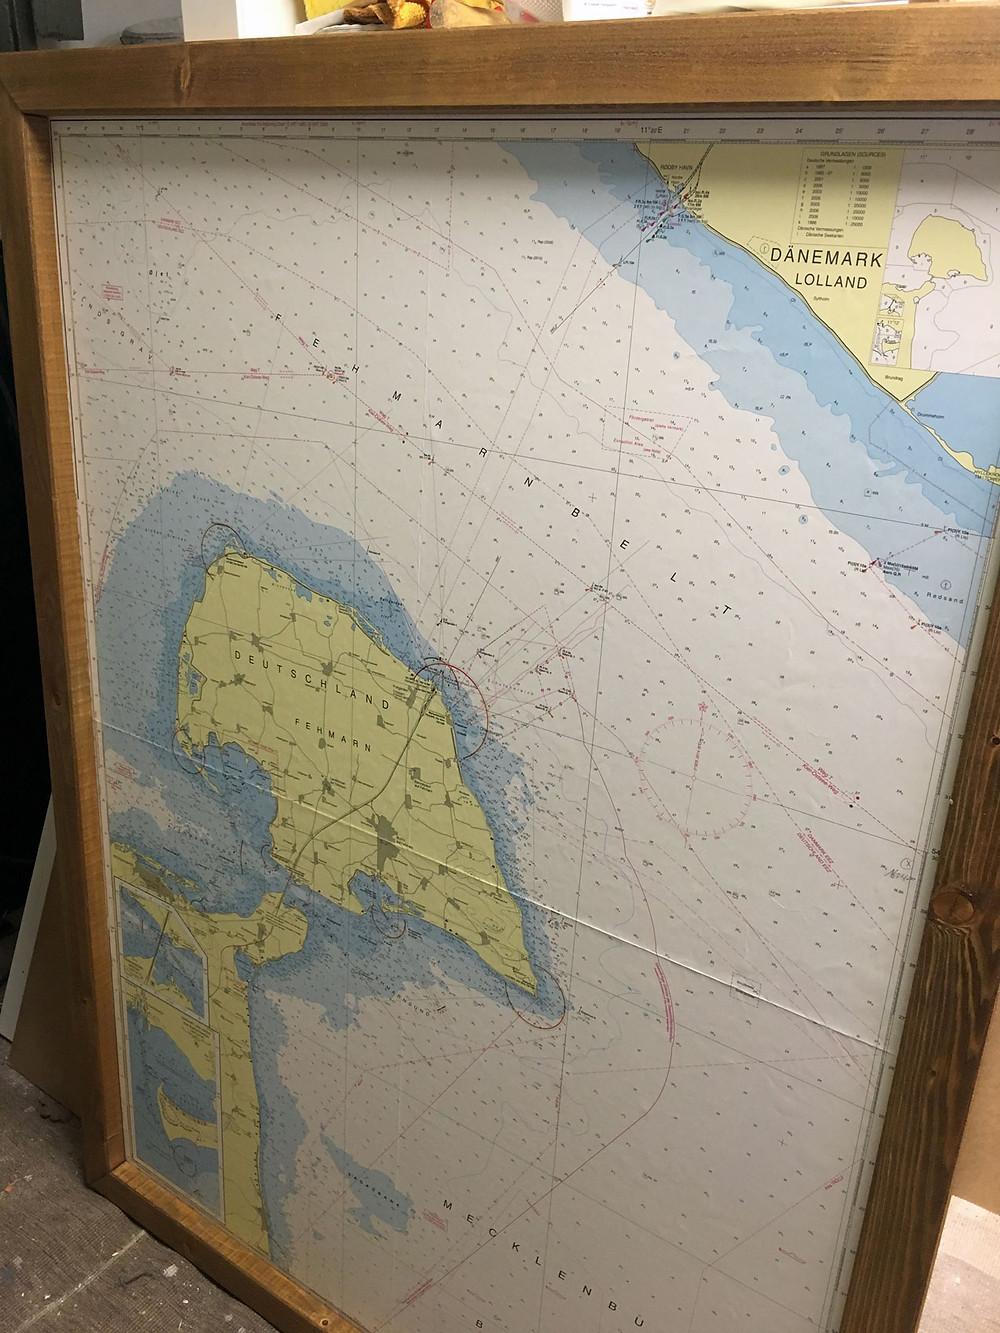 maritime Wanddekoration selber bauen